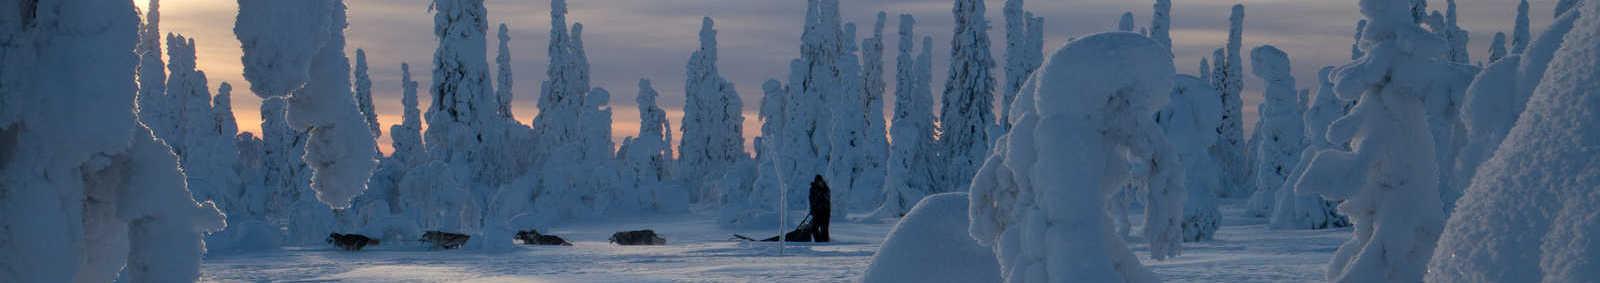 Riisitunturi National Park, Finland (photo by Erkki Ollila)